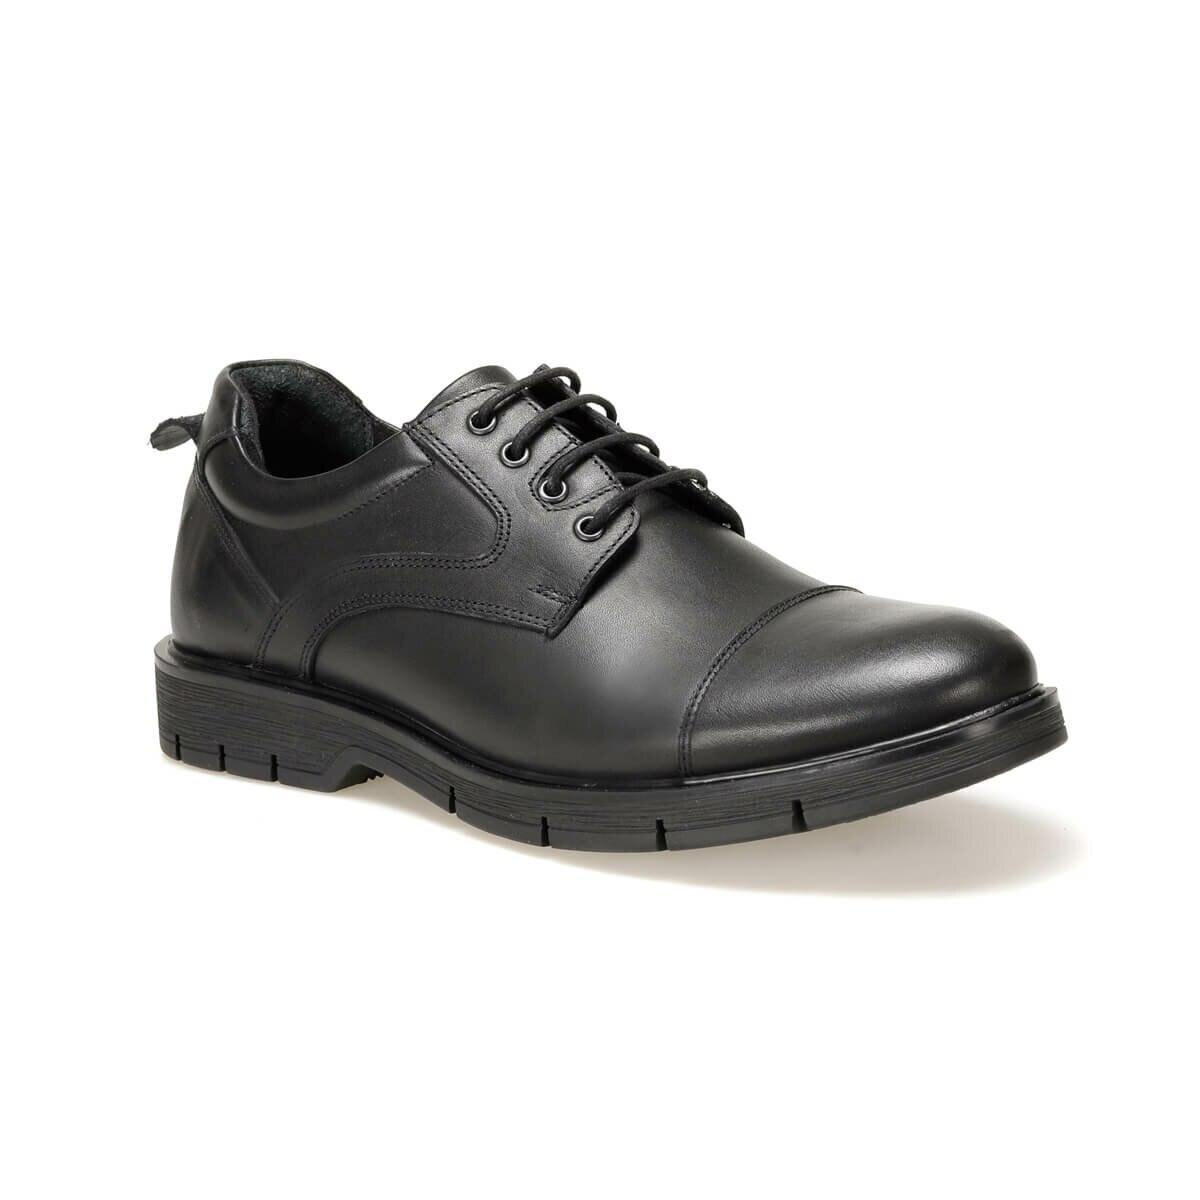 FLO 2020 Black Men 'S Classic Shoes Garamond